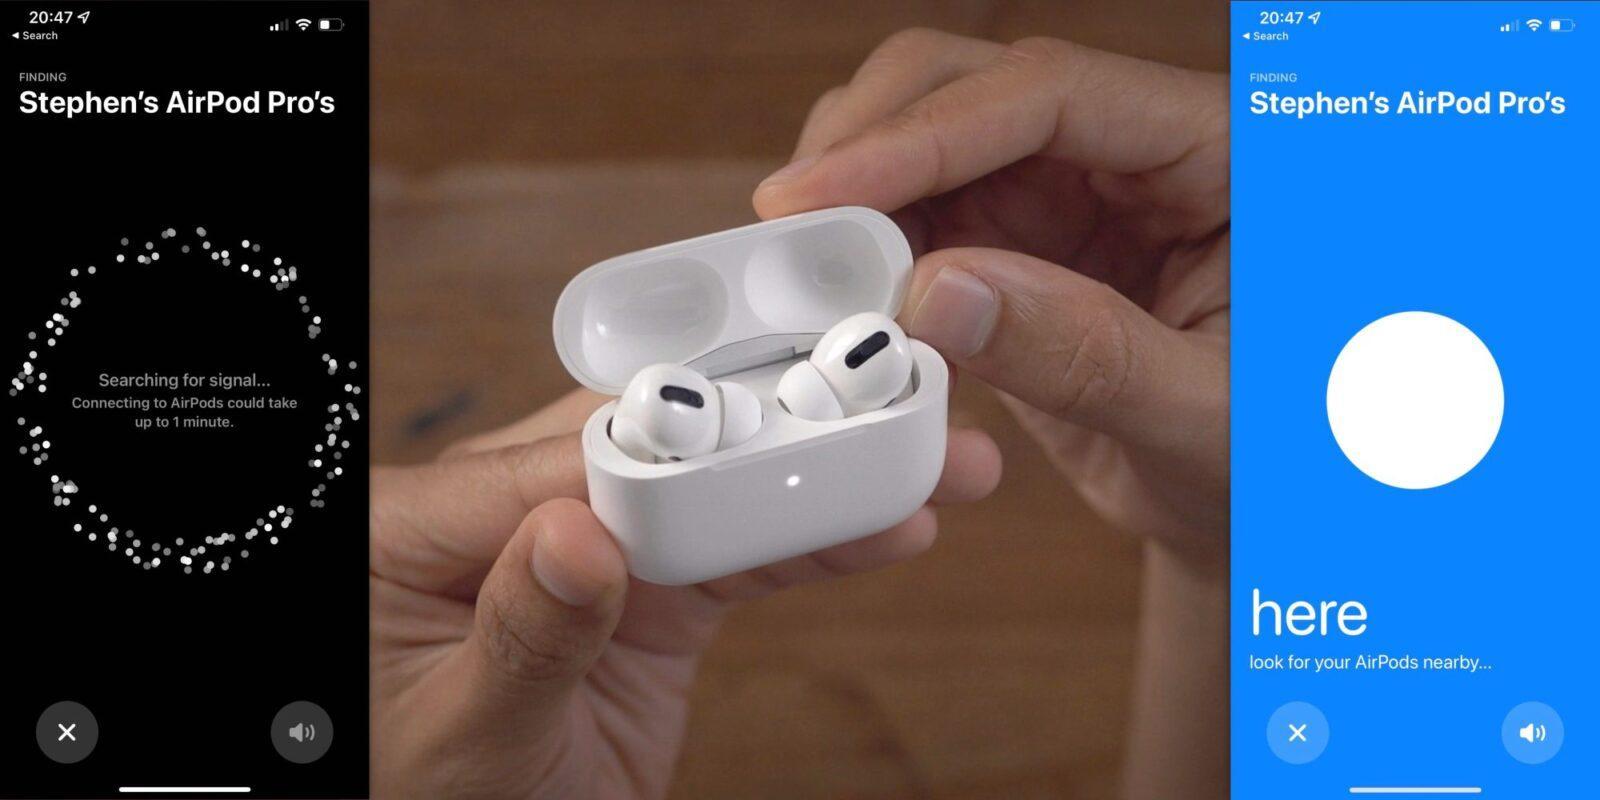 Поиск Apple AirPods Pro и AirPods Max станет проще, благодаря режиму Lost Mode (airpods find my large)